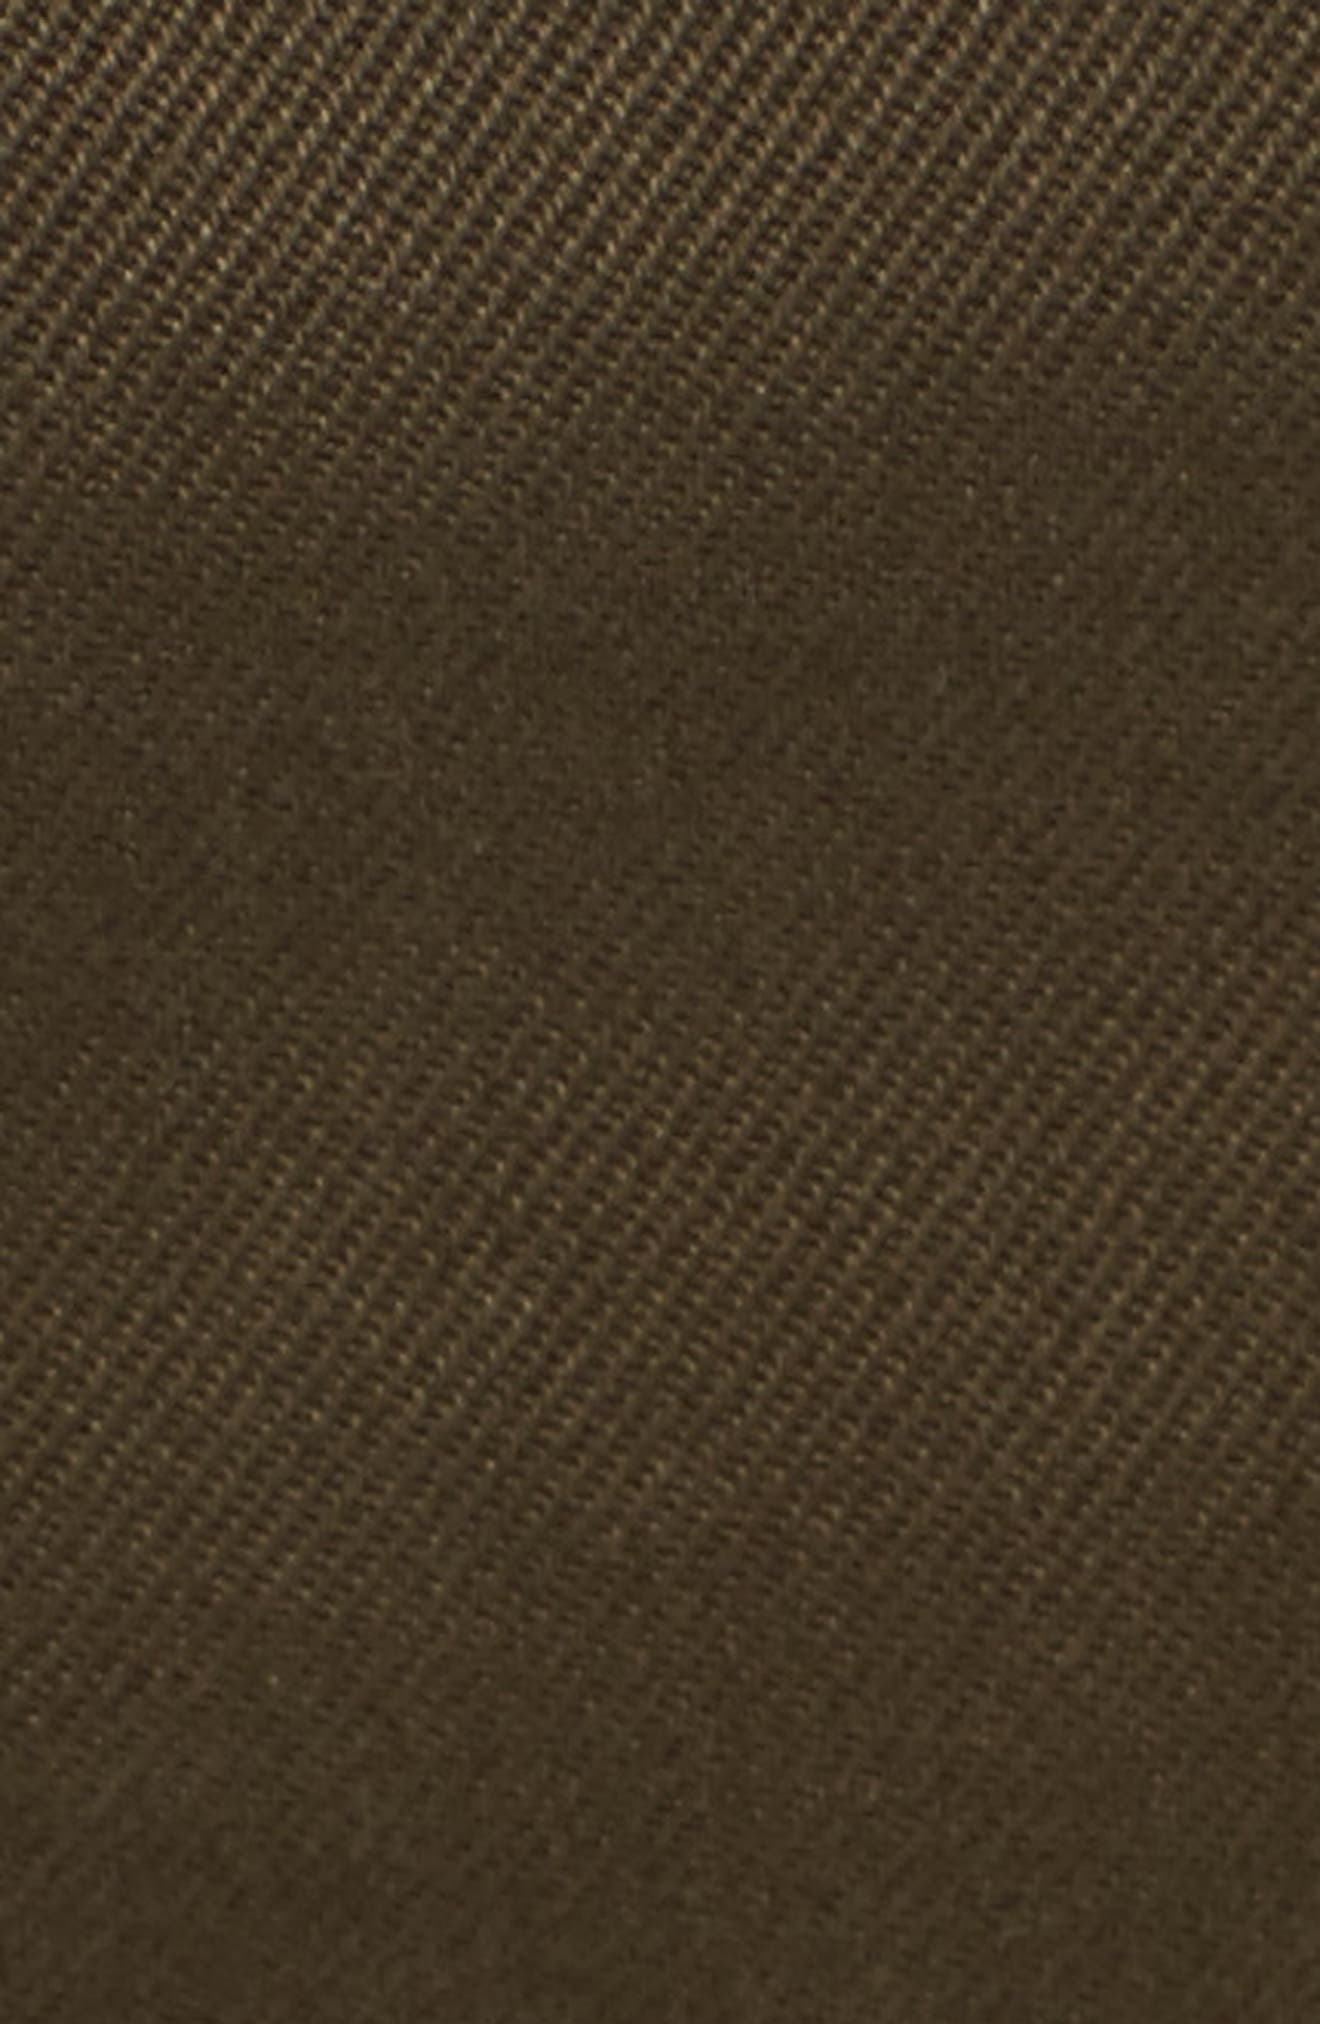 Elliot Slouchy Slim Cargo Pants,                             Alternate thumbnail 6, color,                             205